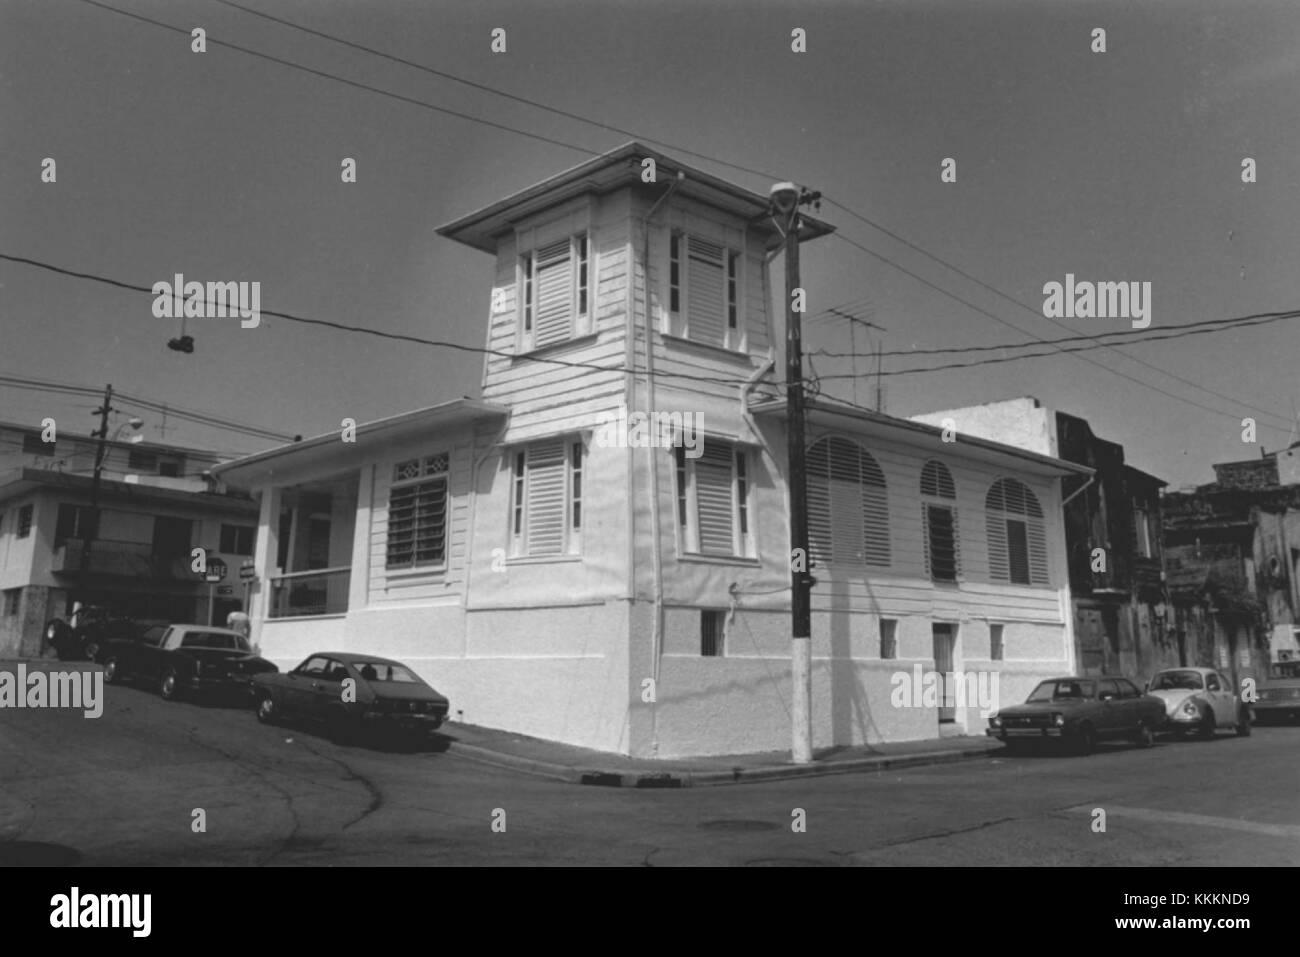 Residencia Ramirez Fuentes 1 - Mayaguez Puerto Rico - Stock Image